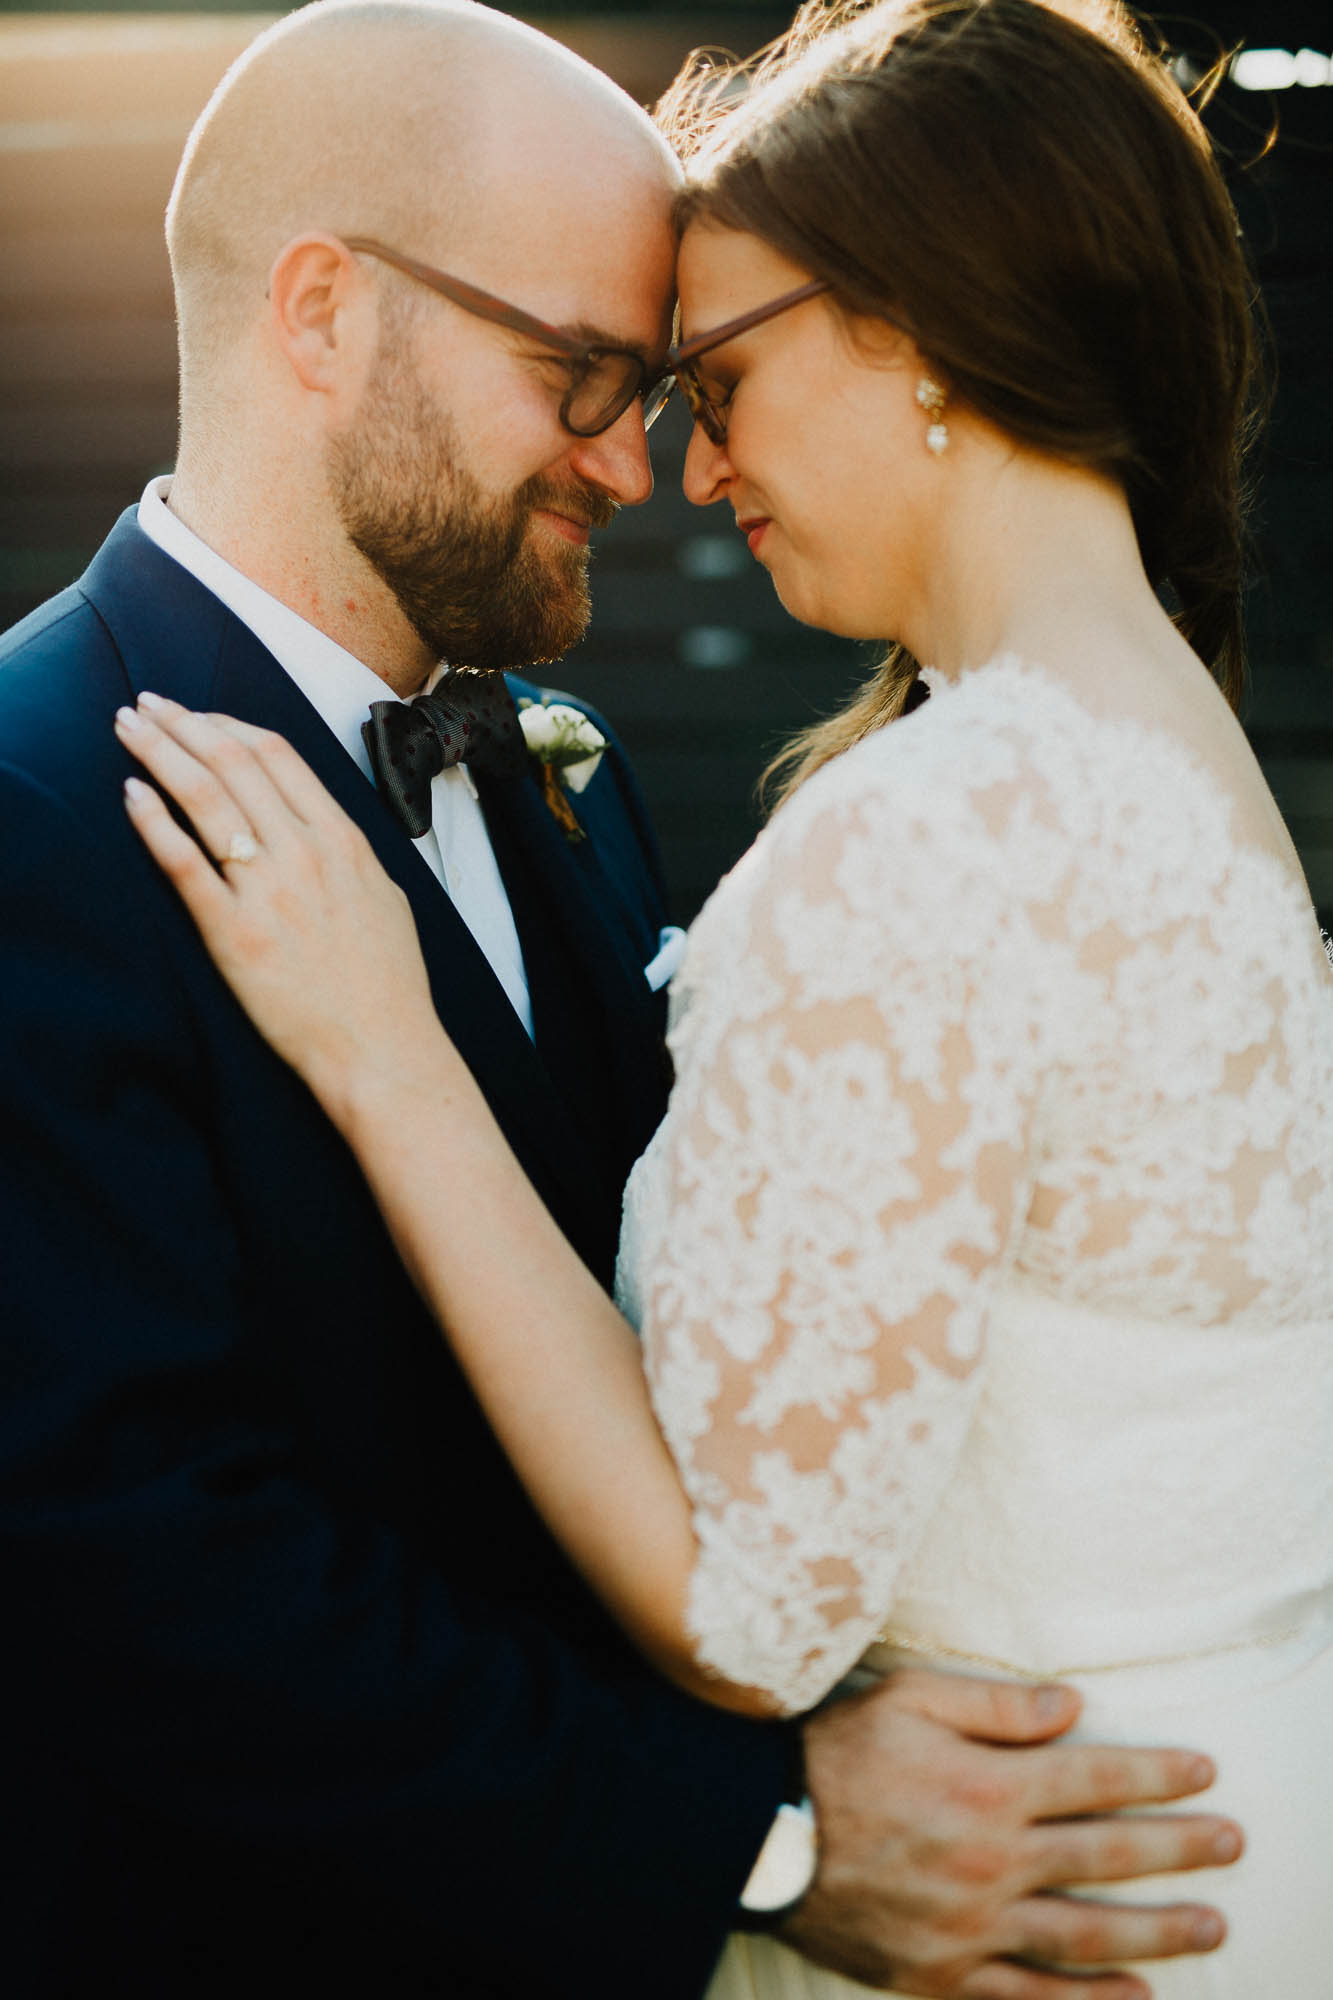 Highline-Car-House-Wedding-Columbus-Kristin-Aaron-052.jpg